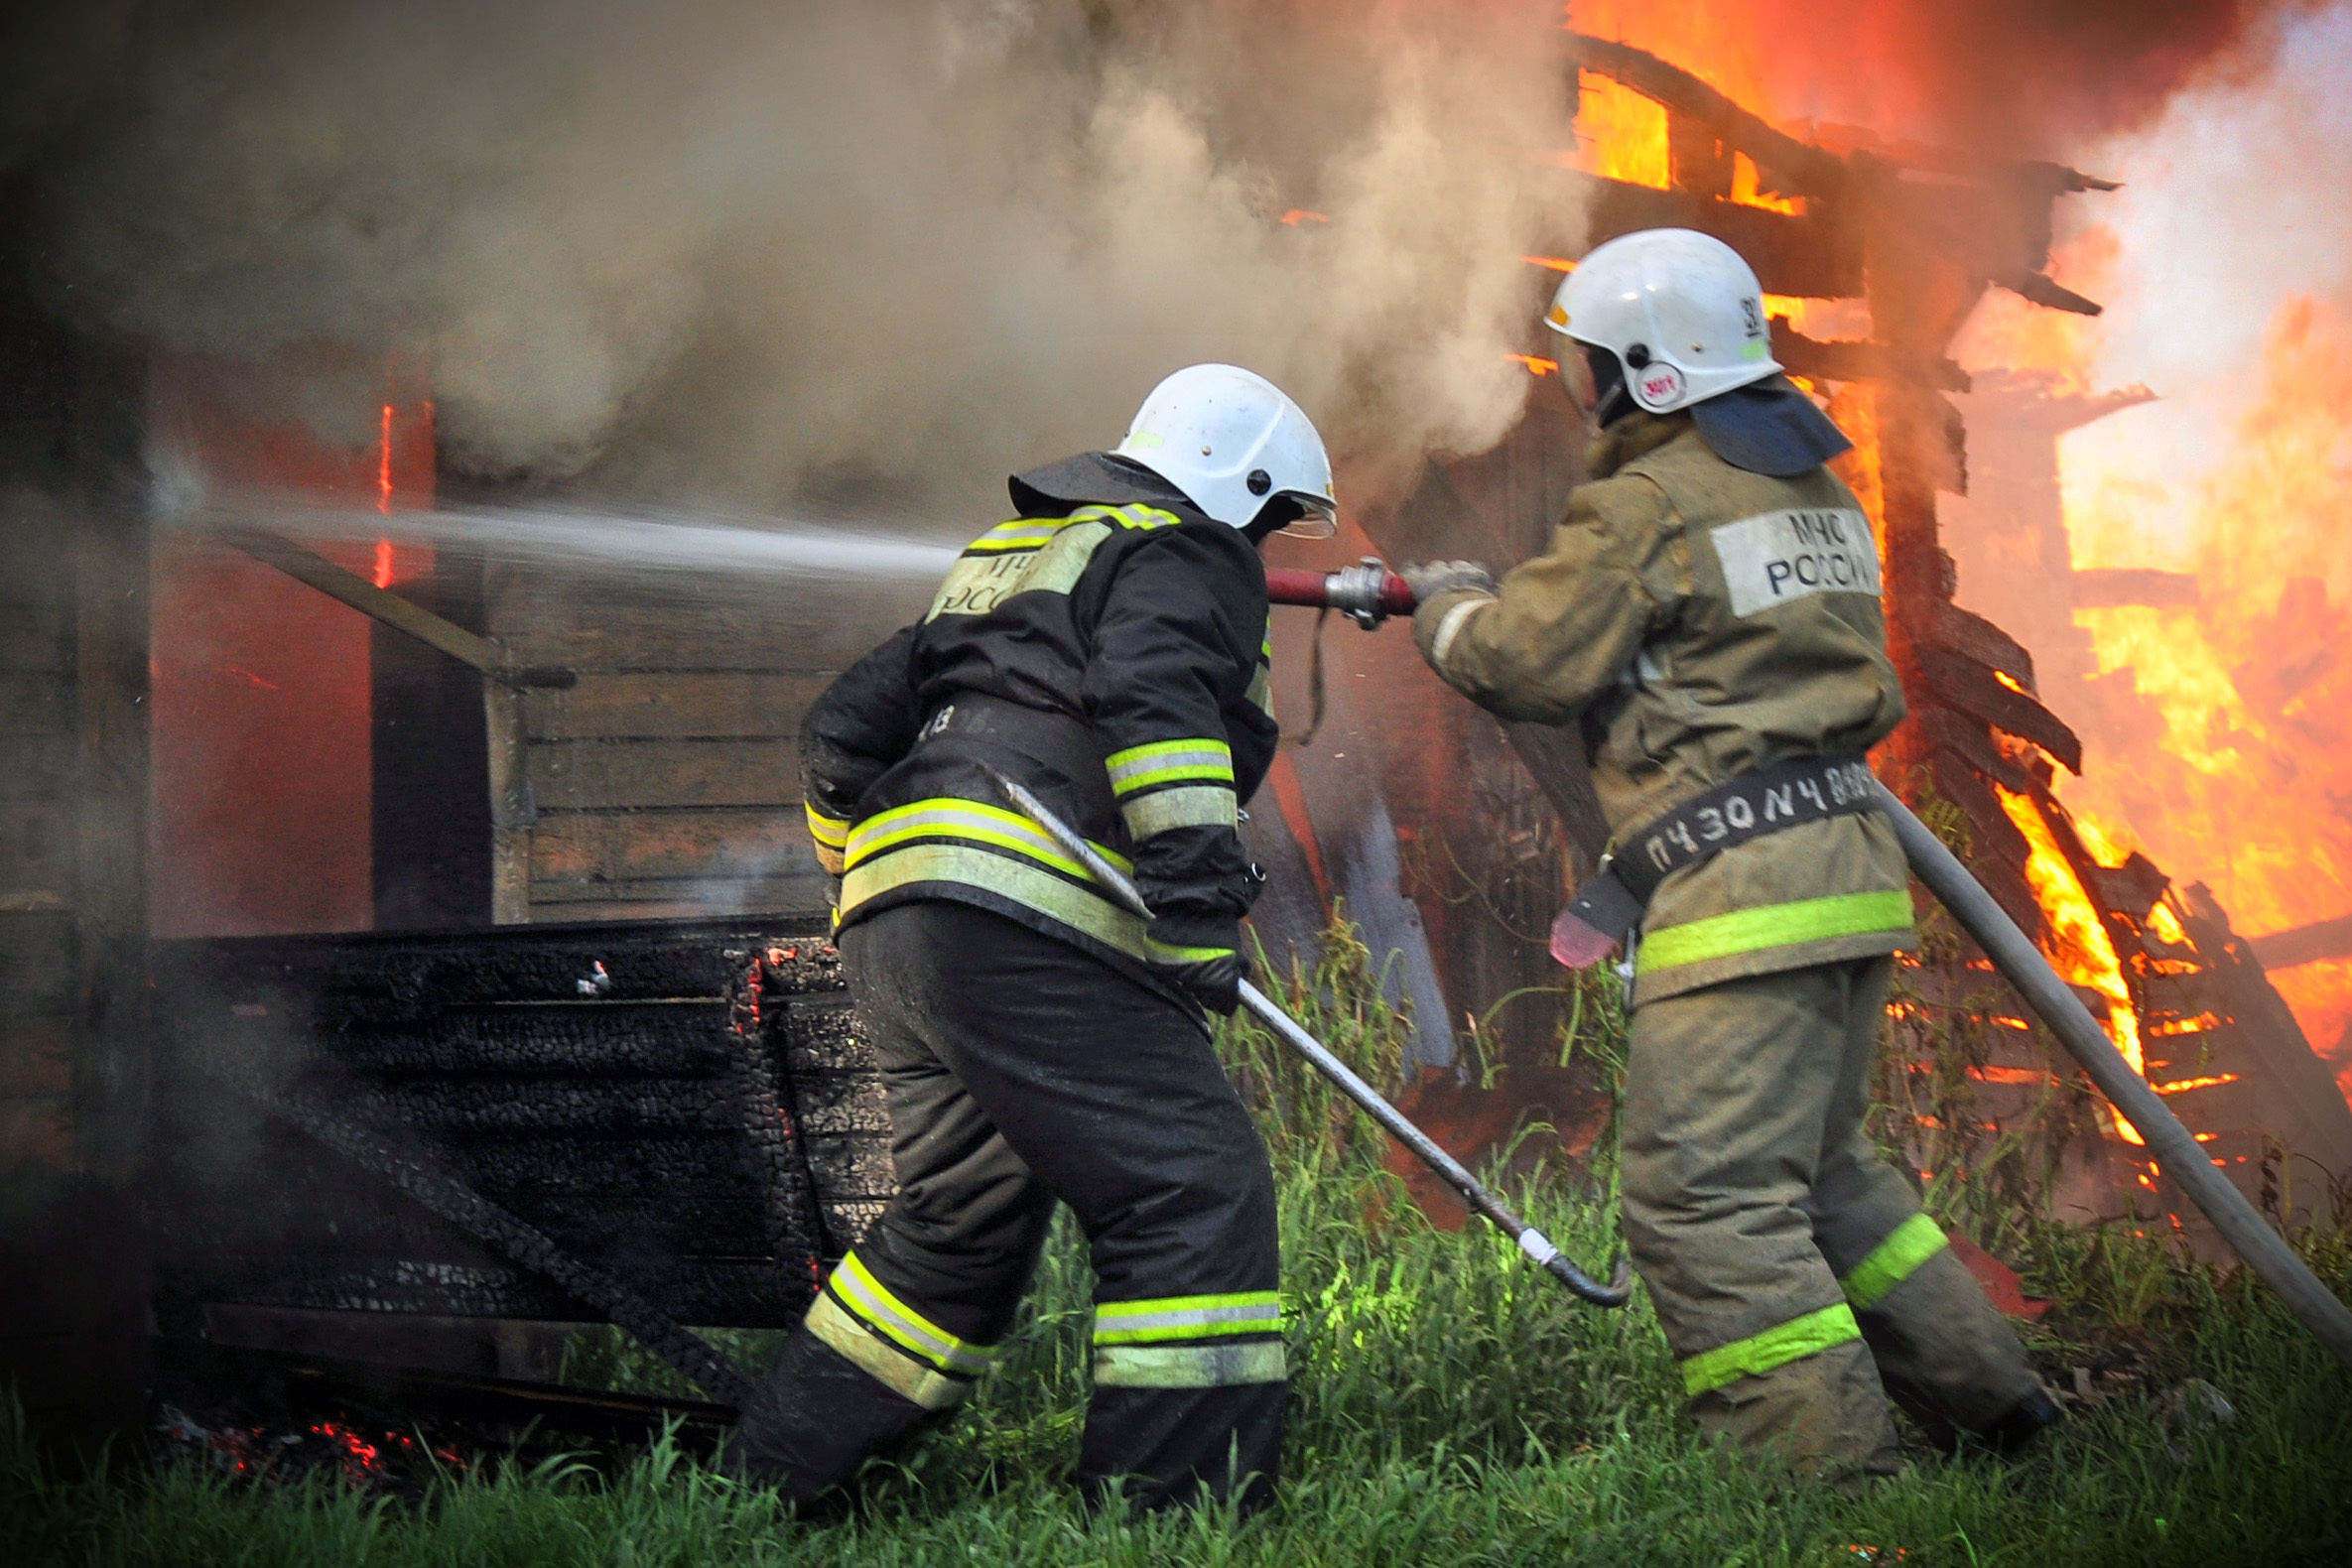 пожарники тушат пожар картинки умка было